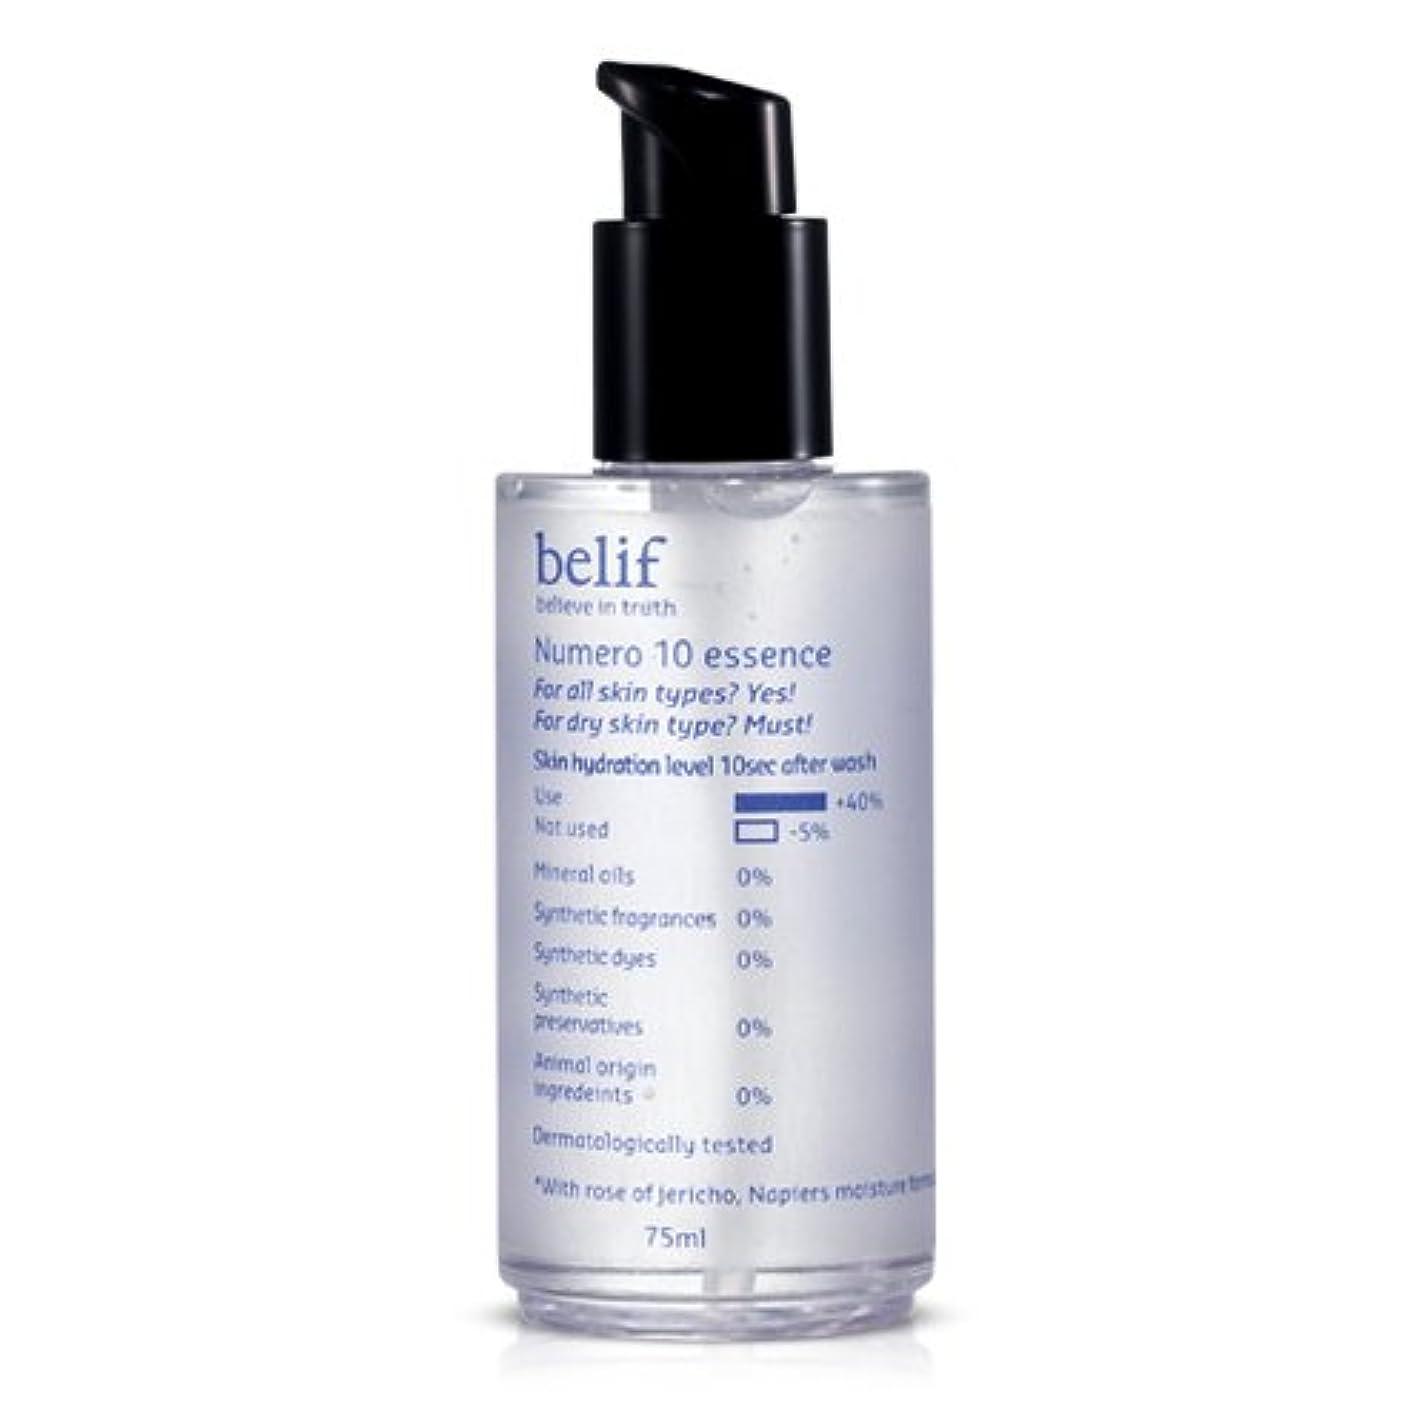 Belif(ビリーフ)Numero 10 essence 75mlニューメロ10エッセンス